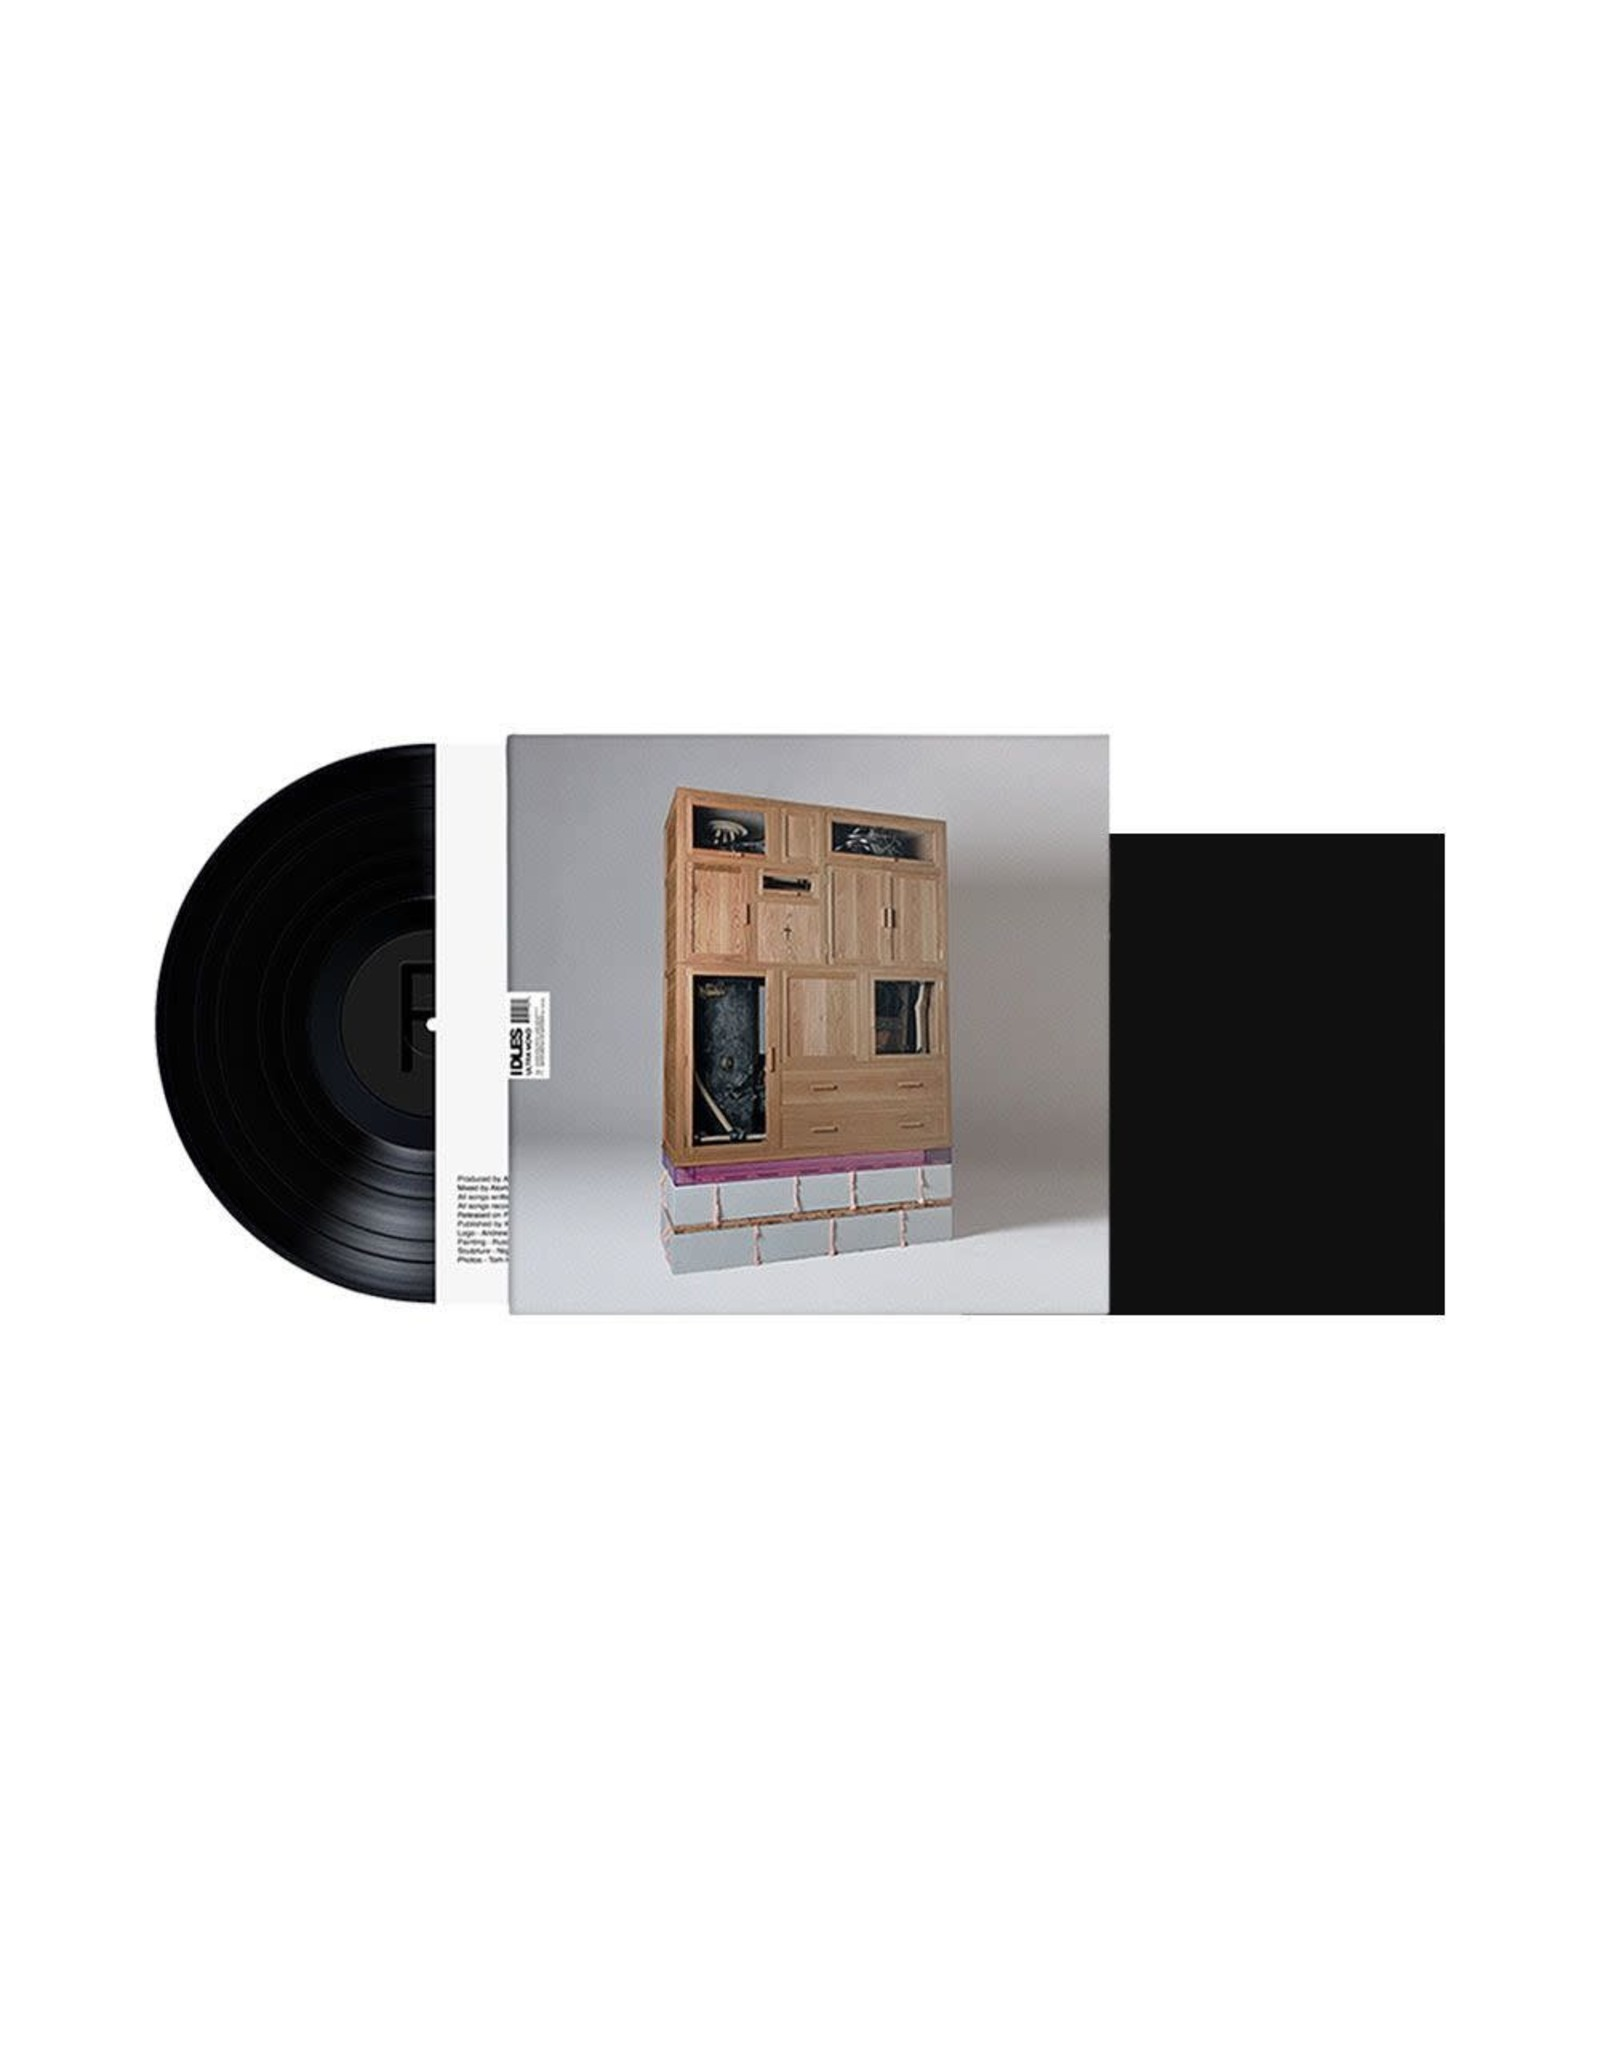 IDLES - Ultra Mono (Deluxe Vinyl Edition)